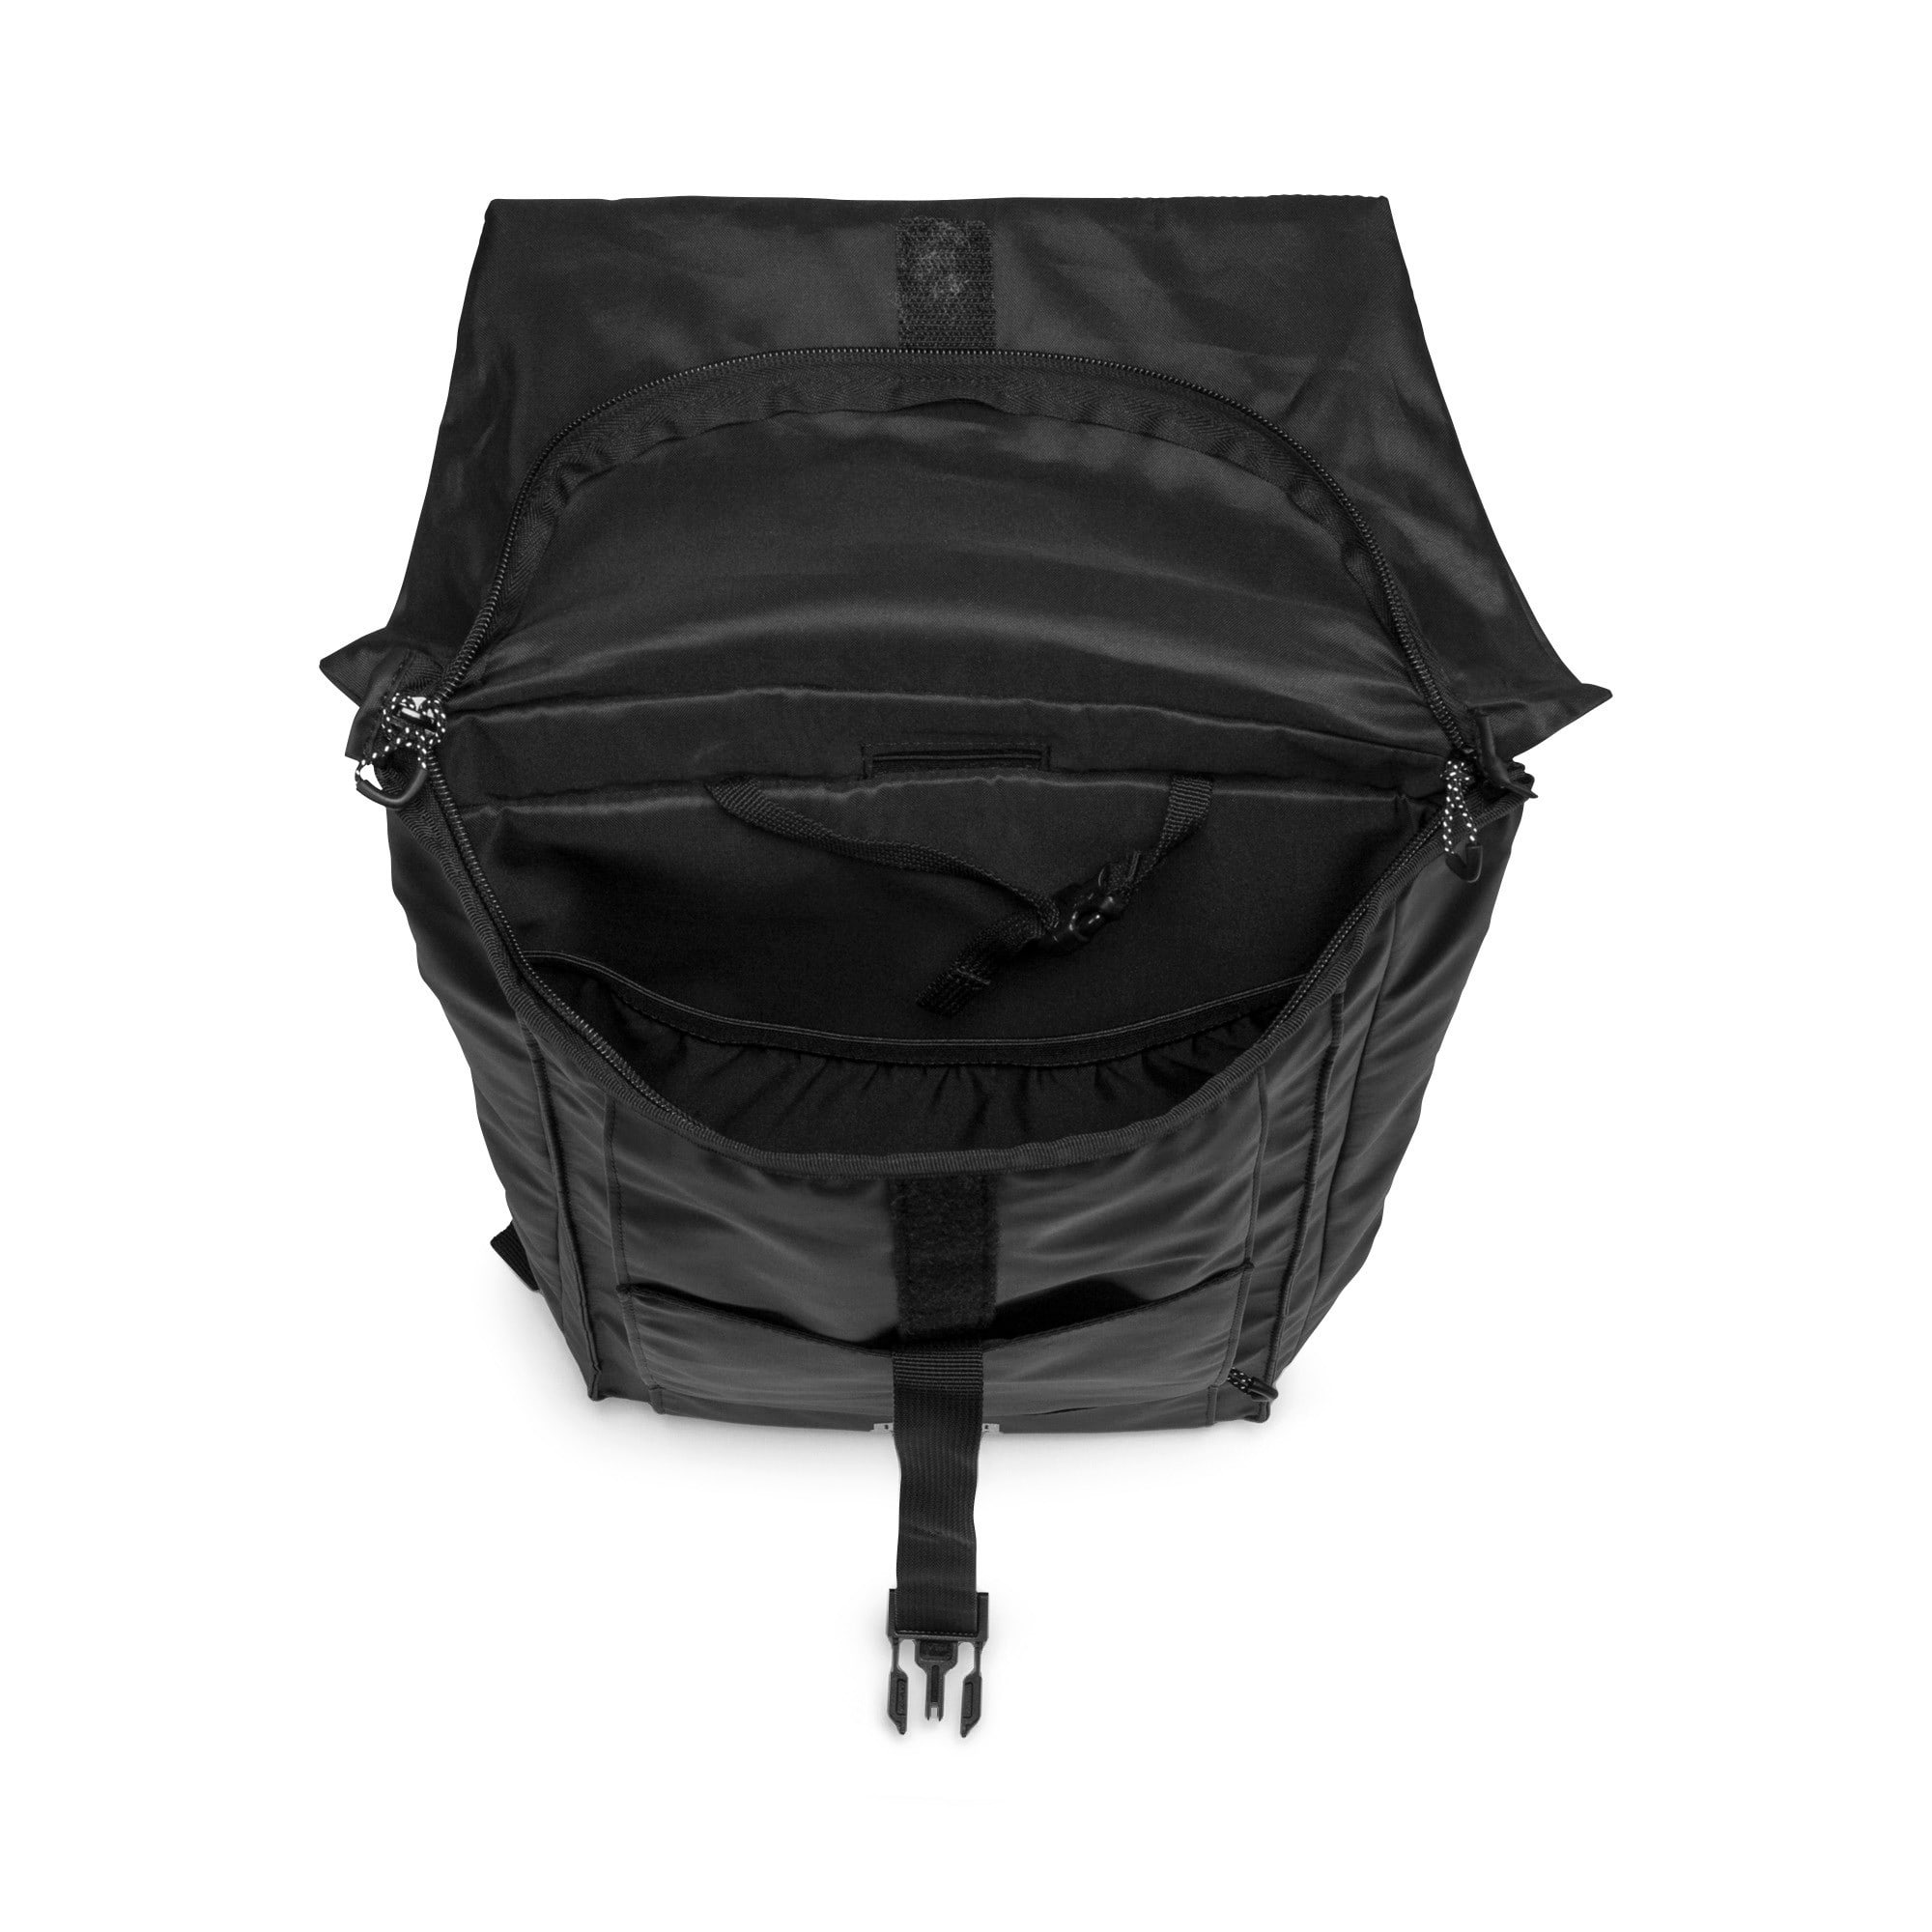 Thumbnail 4 of Street Running Backpack, Puma Black, medium